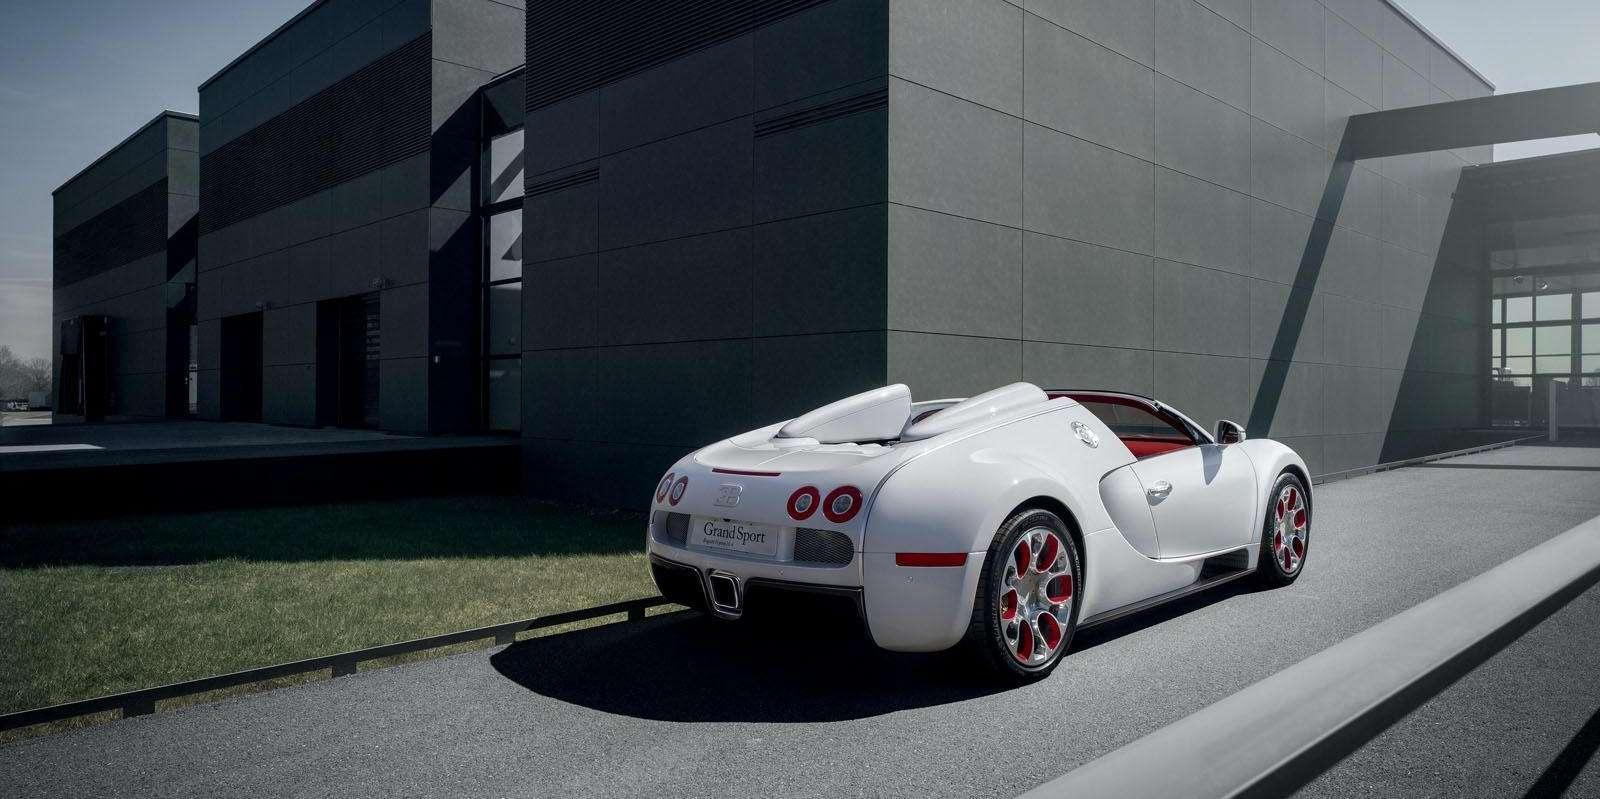 bugatti veyron 16 4 grand sport wei long best 2 travel wallpaper. Black Bedroom Furniture Sets. Home Design Ideas